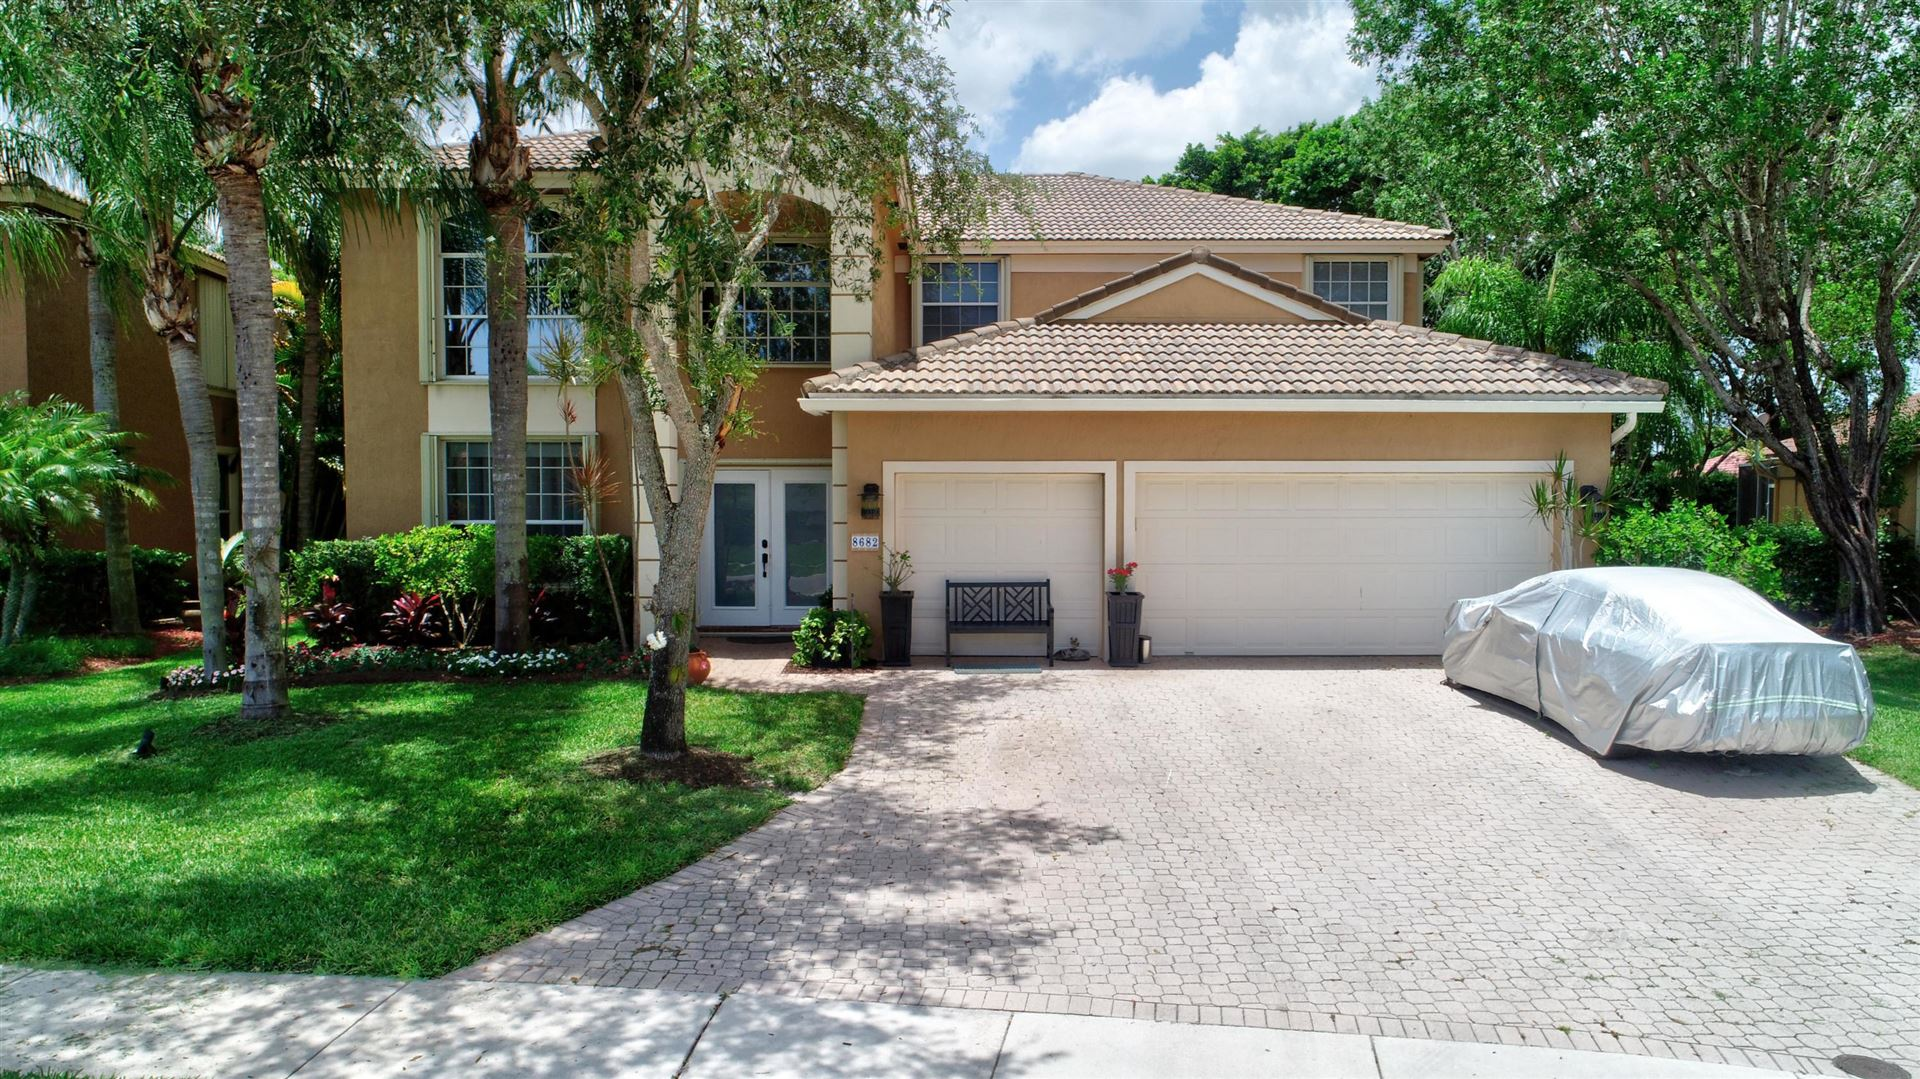 8682 Via Ancho Road, Boca Raton, FL 33433 - #: RX-10632984